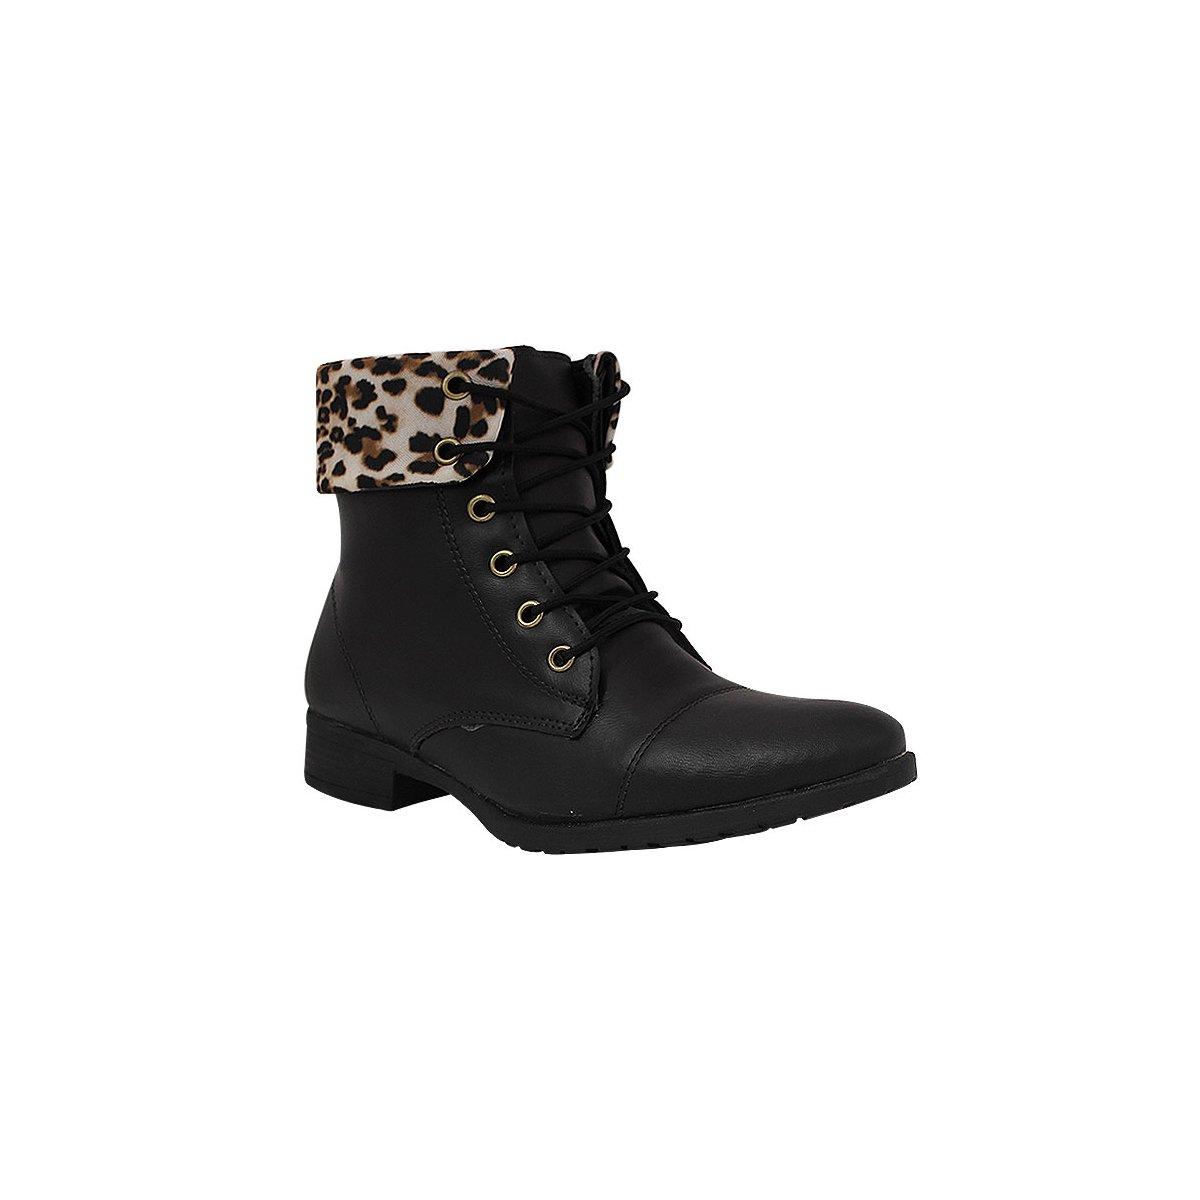 9157225f4 Bota Anitta Coturno - Compre Agora   Netshoes